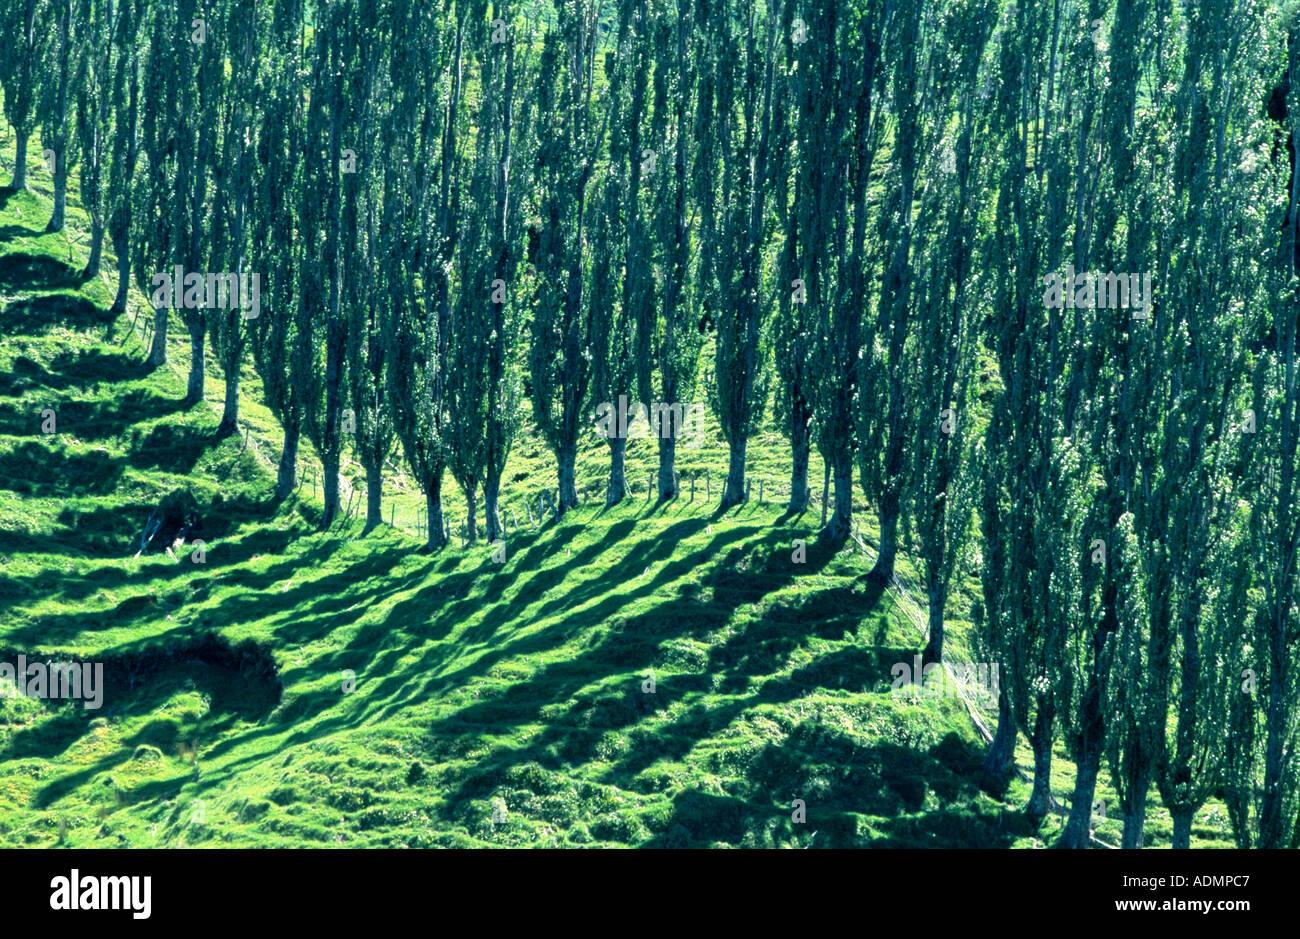 trees along Forgotten World Highway, New Zealand, Northern Island - Stock Image